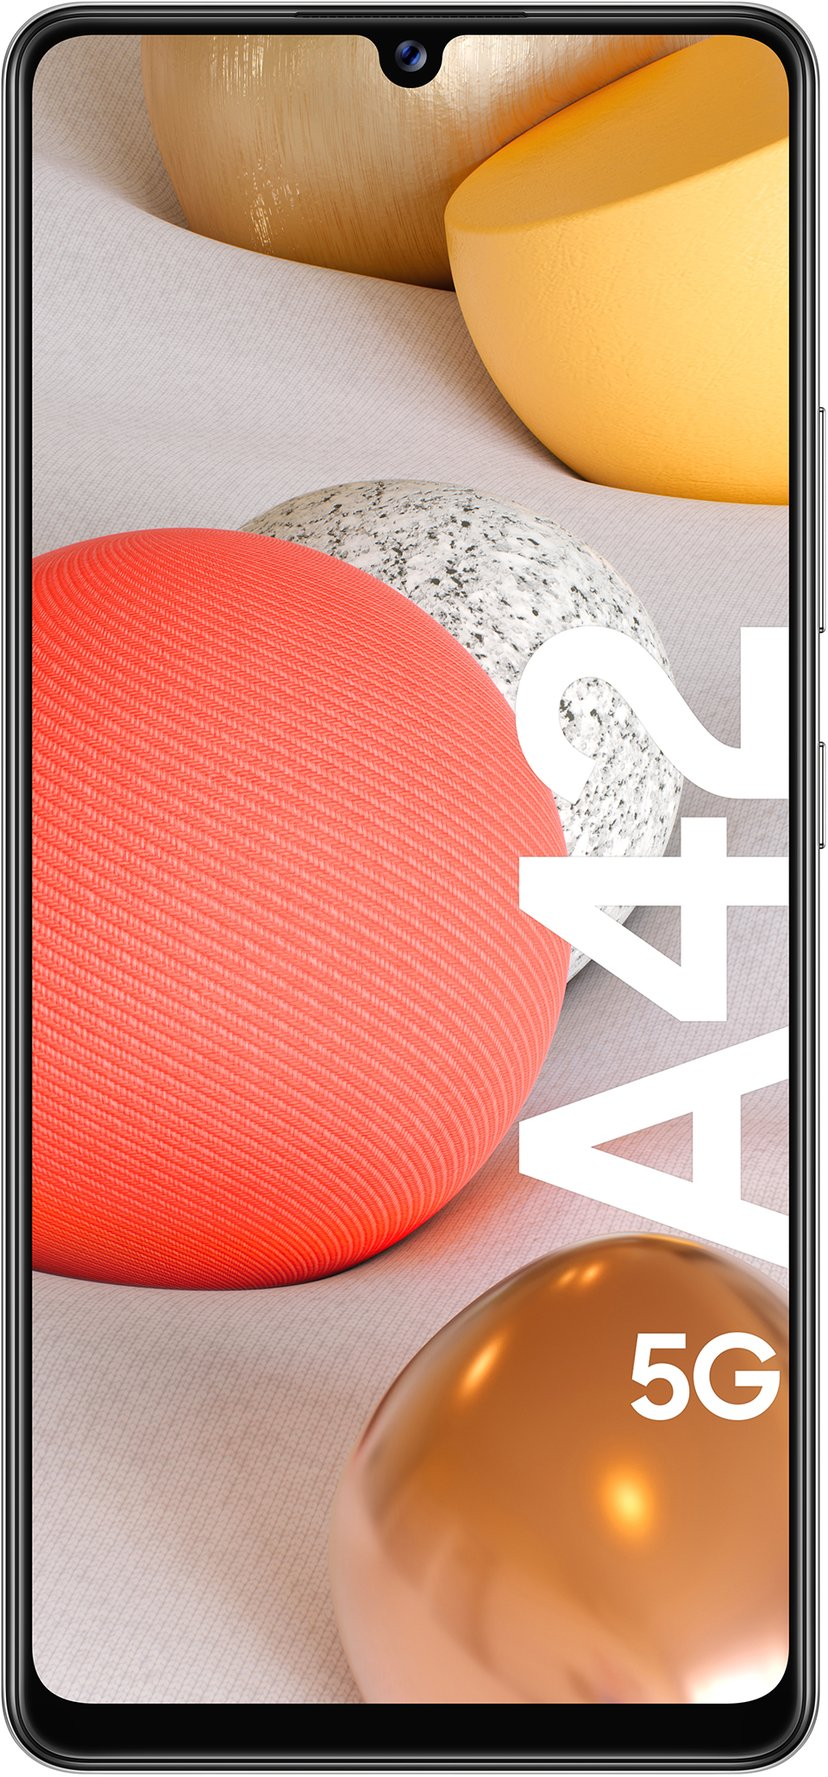 Samsung Galaxy A42 5G 128GB Dobbelt-SIM Prismeprikkgrå